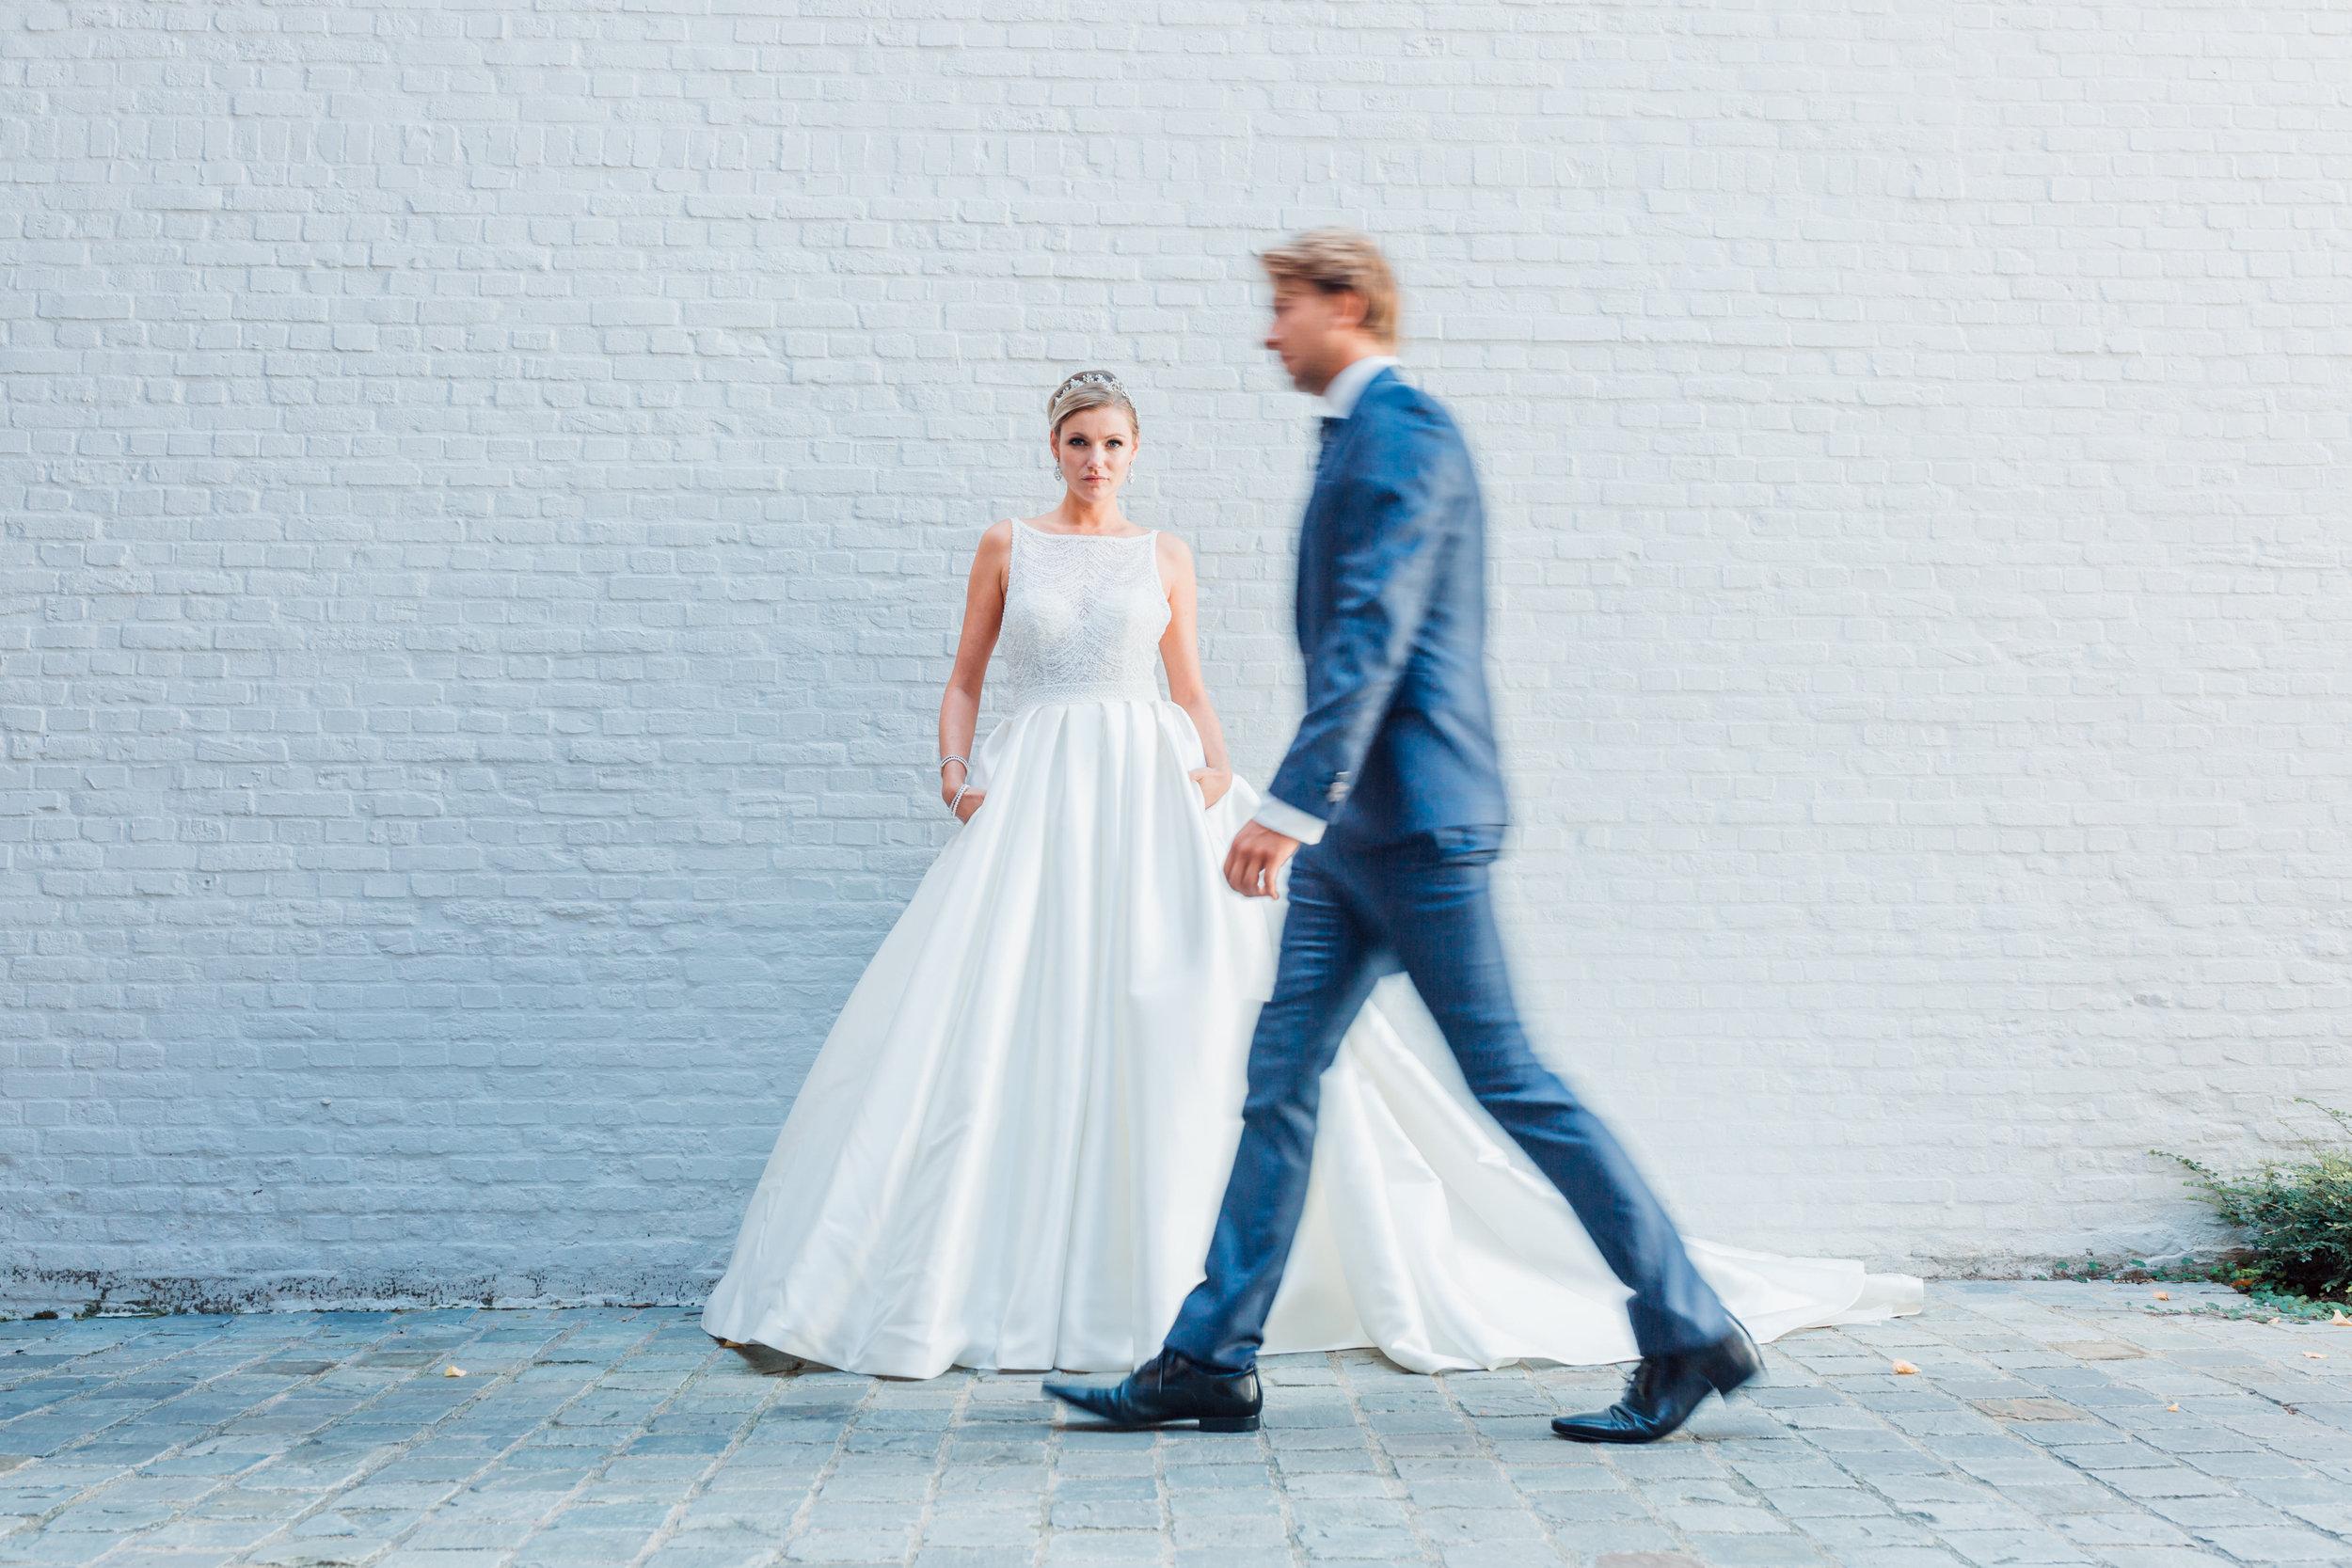 Lien & Marcel - Styled shoot voor Linx Fashion - 15 september 2019